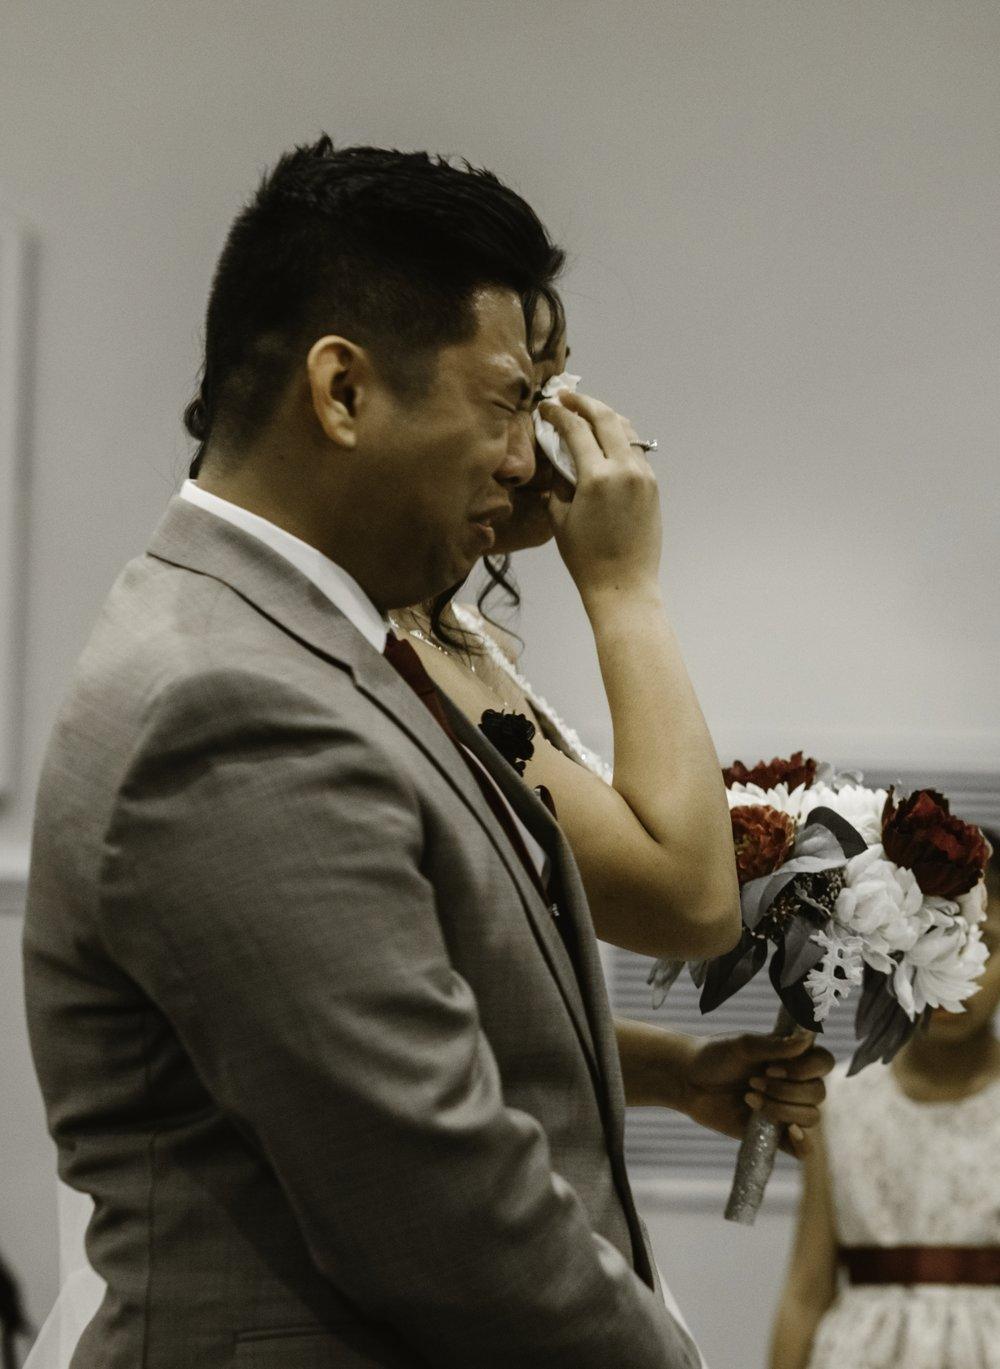 Wedding | St Augustine | Bay View at A1A aleworks| Roxanne and LJ | Vanessa Boy | Orlando Florida | Vanessa Boy | vanessaboy.com-131final.jpg